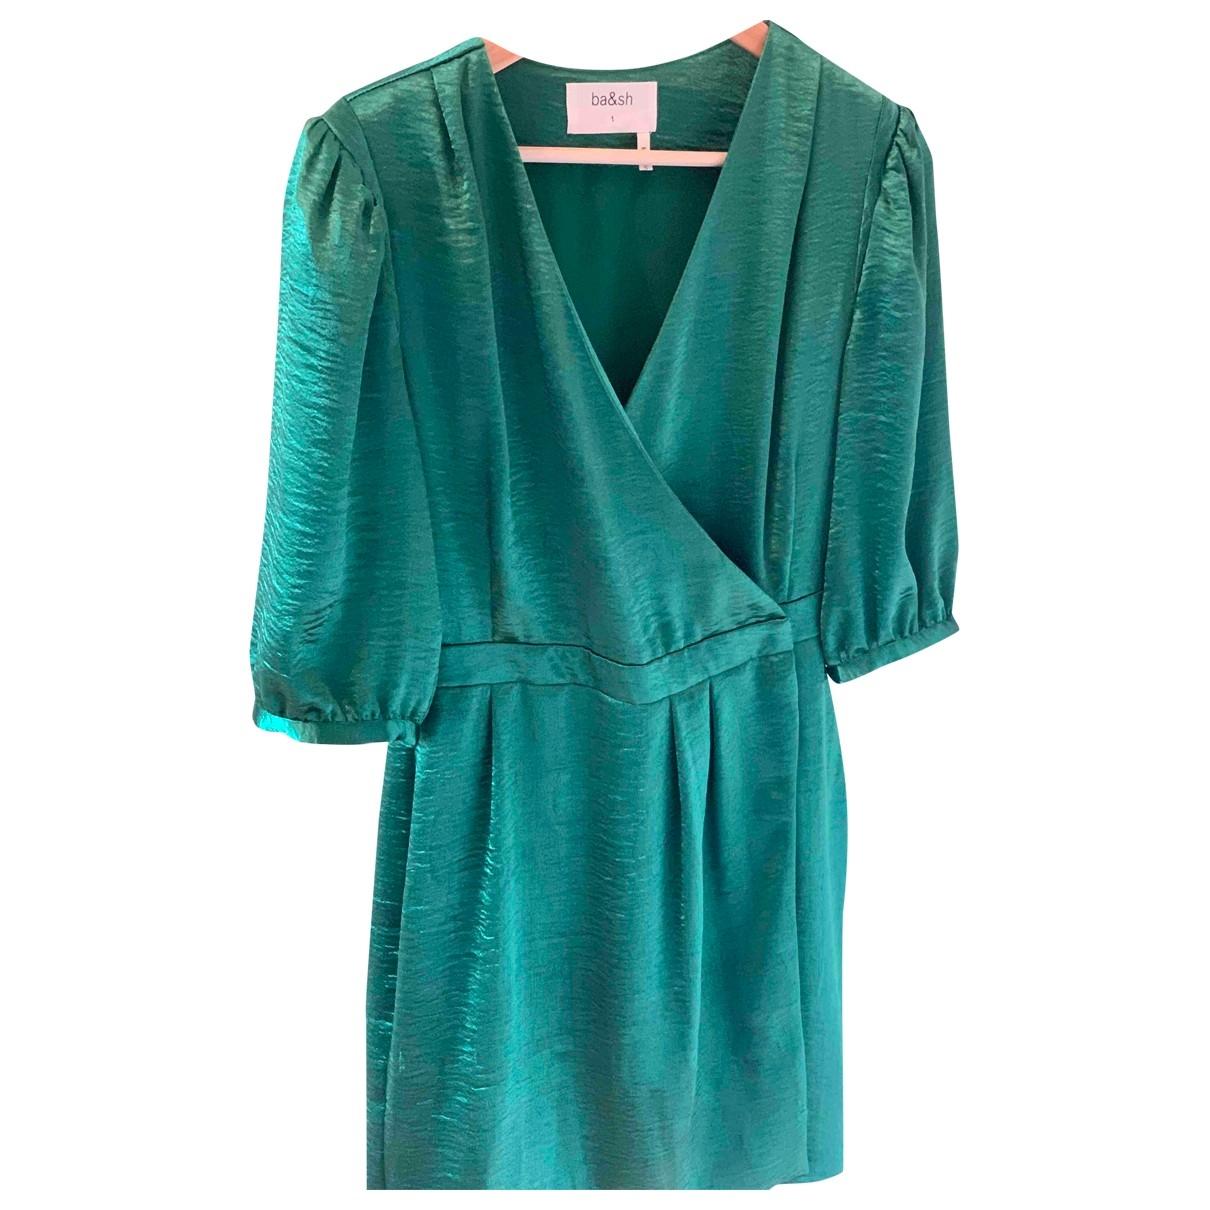 Ba&sh \N Green Silk dress for Women 1 US